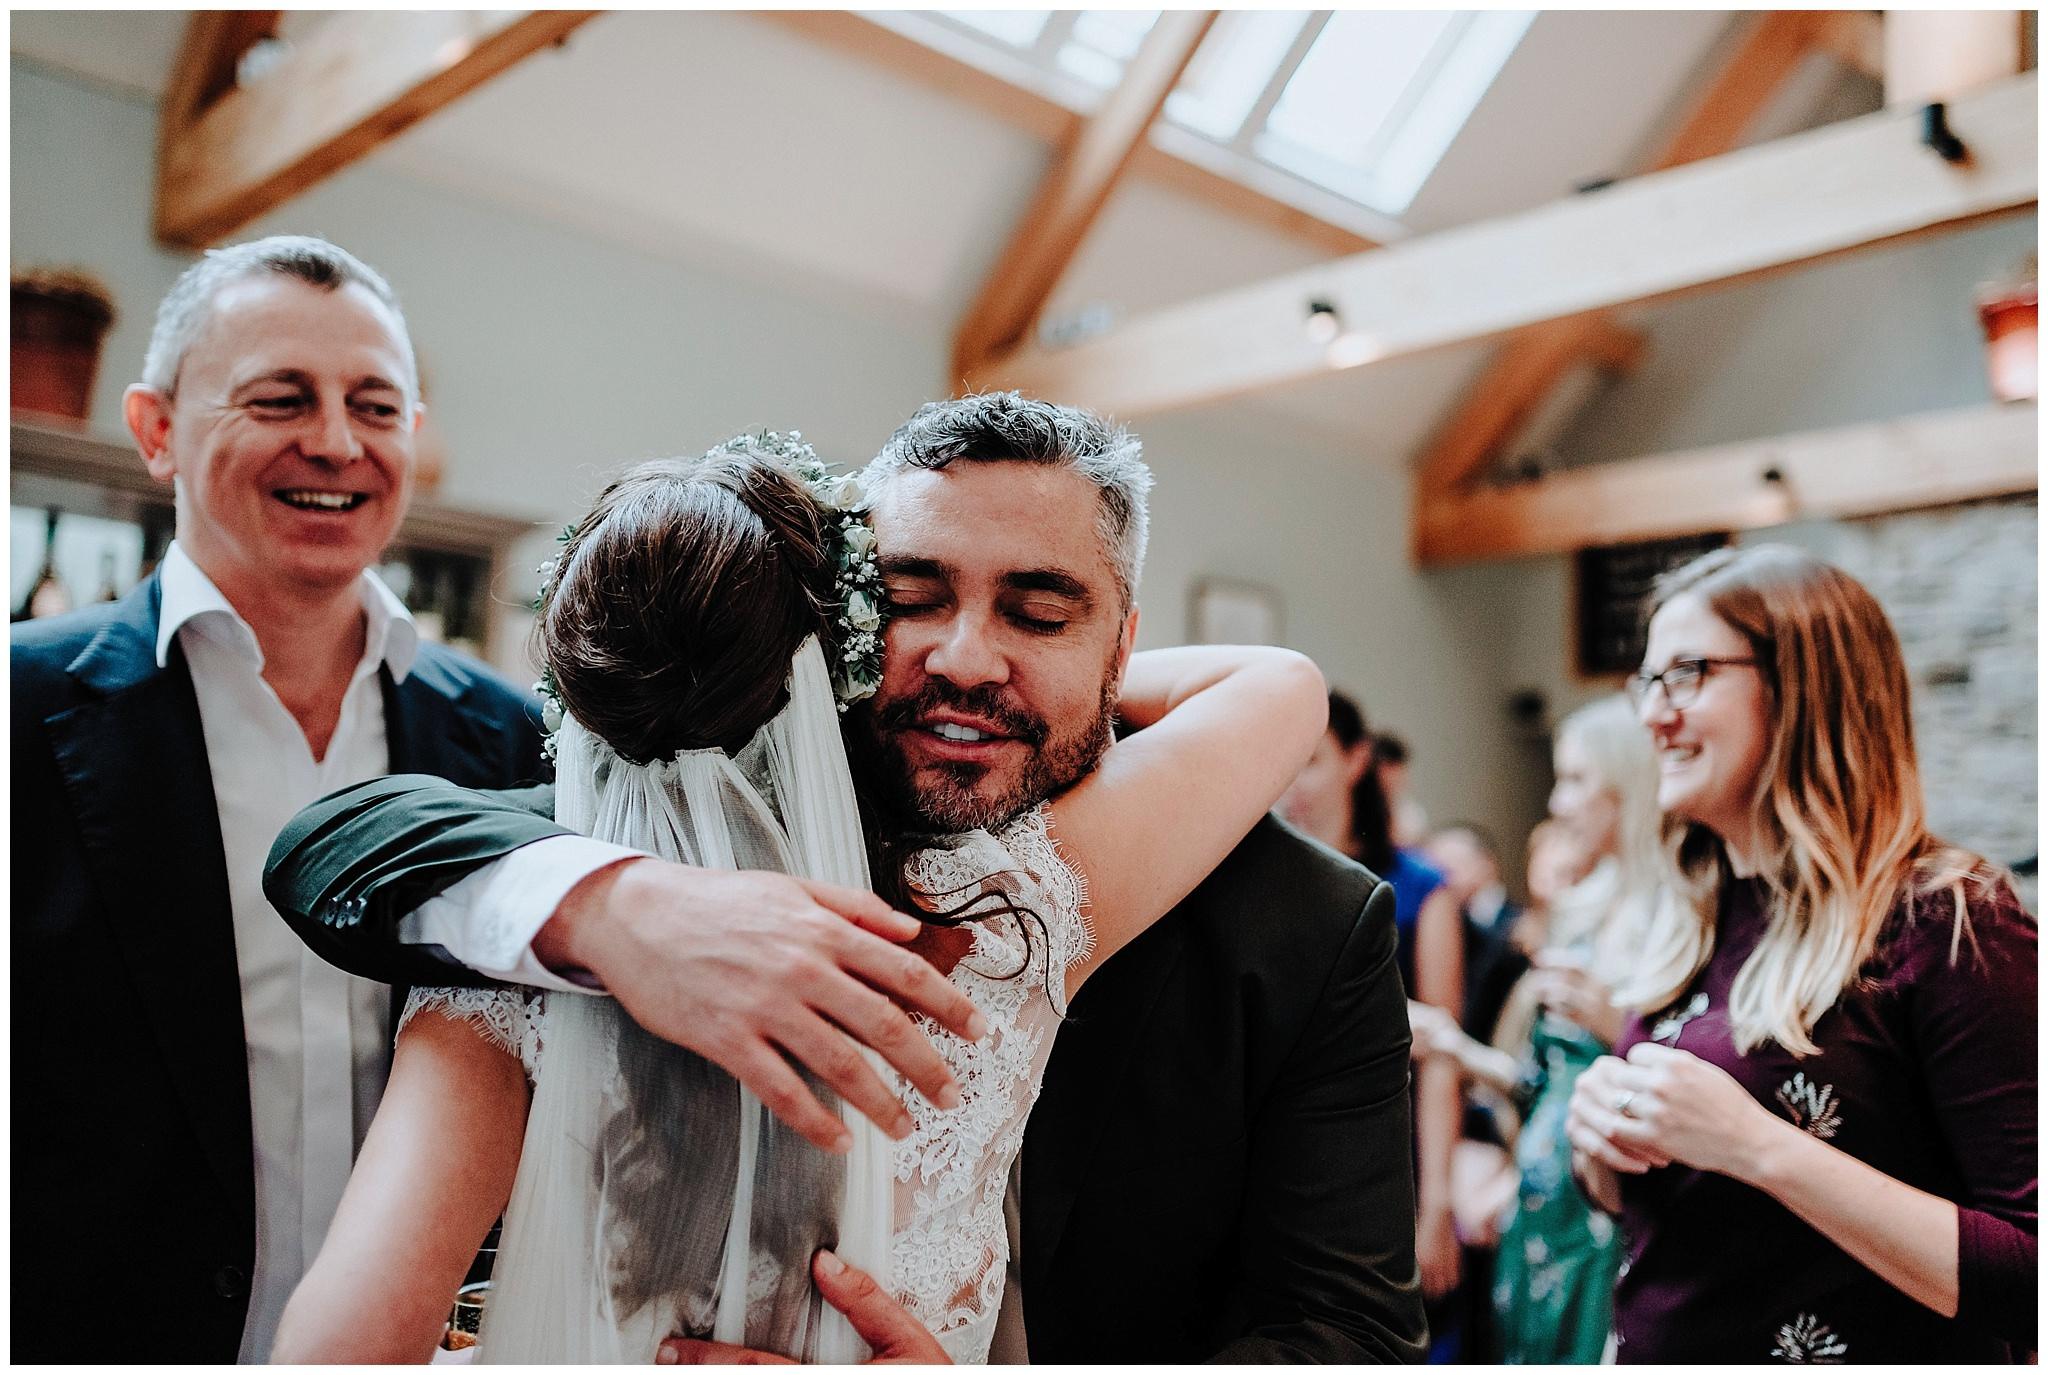 Guest hugging the Bride